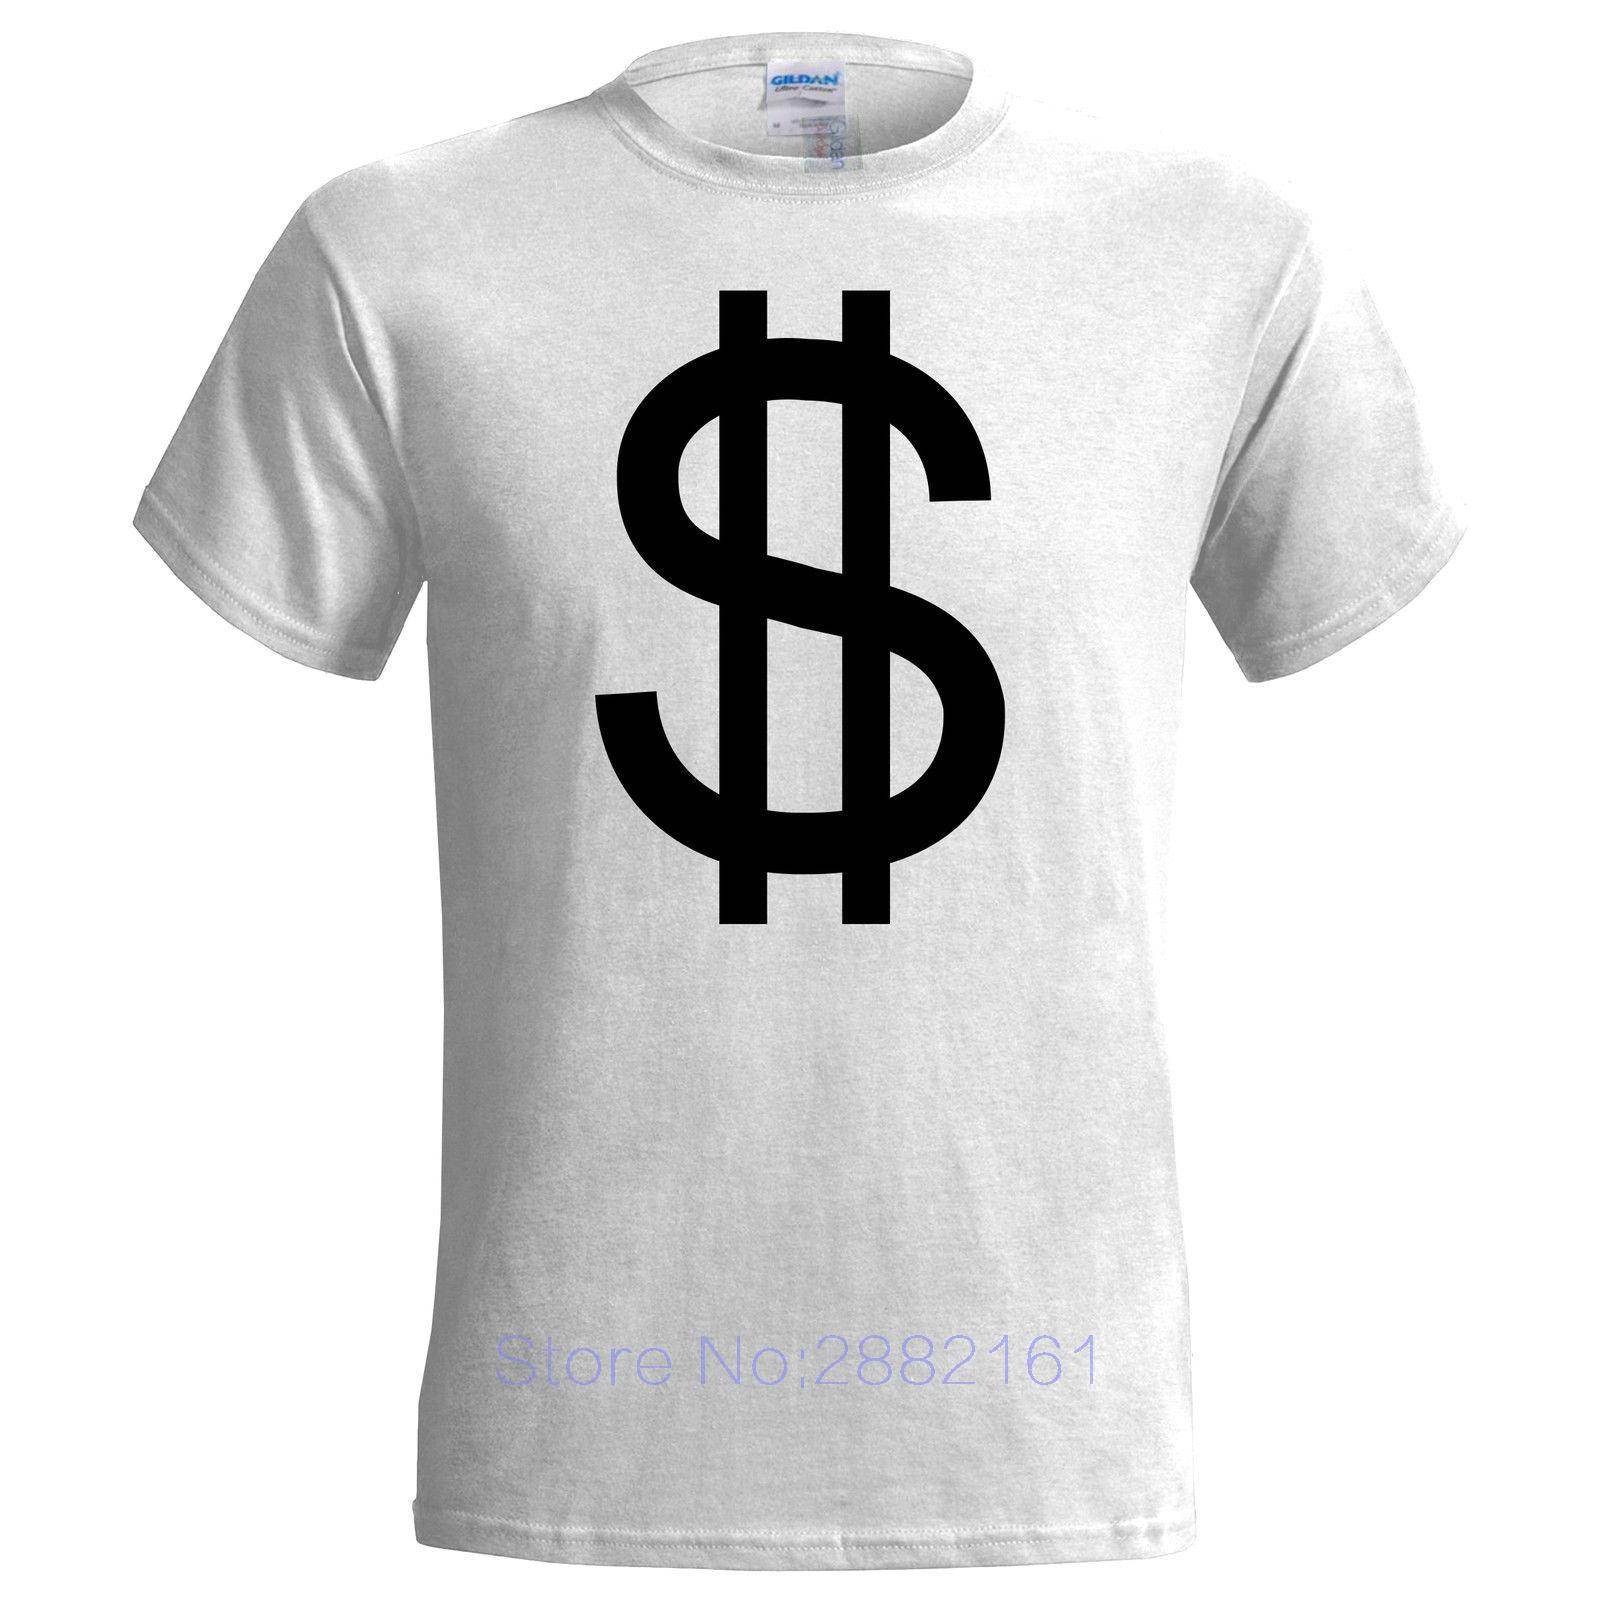 Design t shirt price - Large Dollar Sign Mens T Shirt Design Money America Us Canadian Cash Australian Short Sleeves New